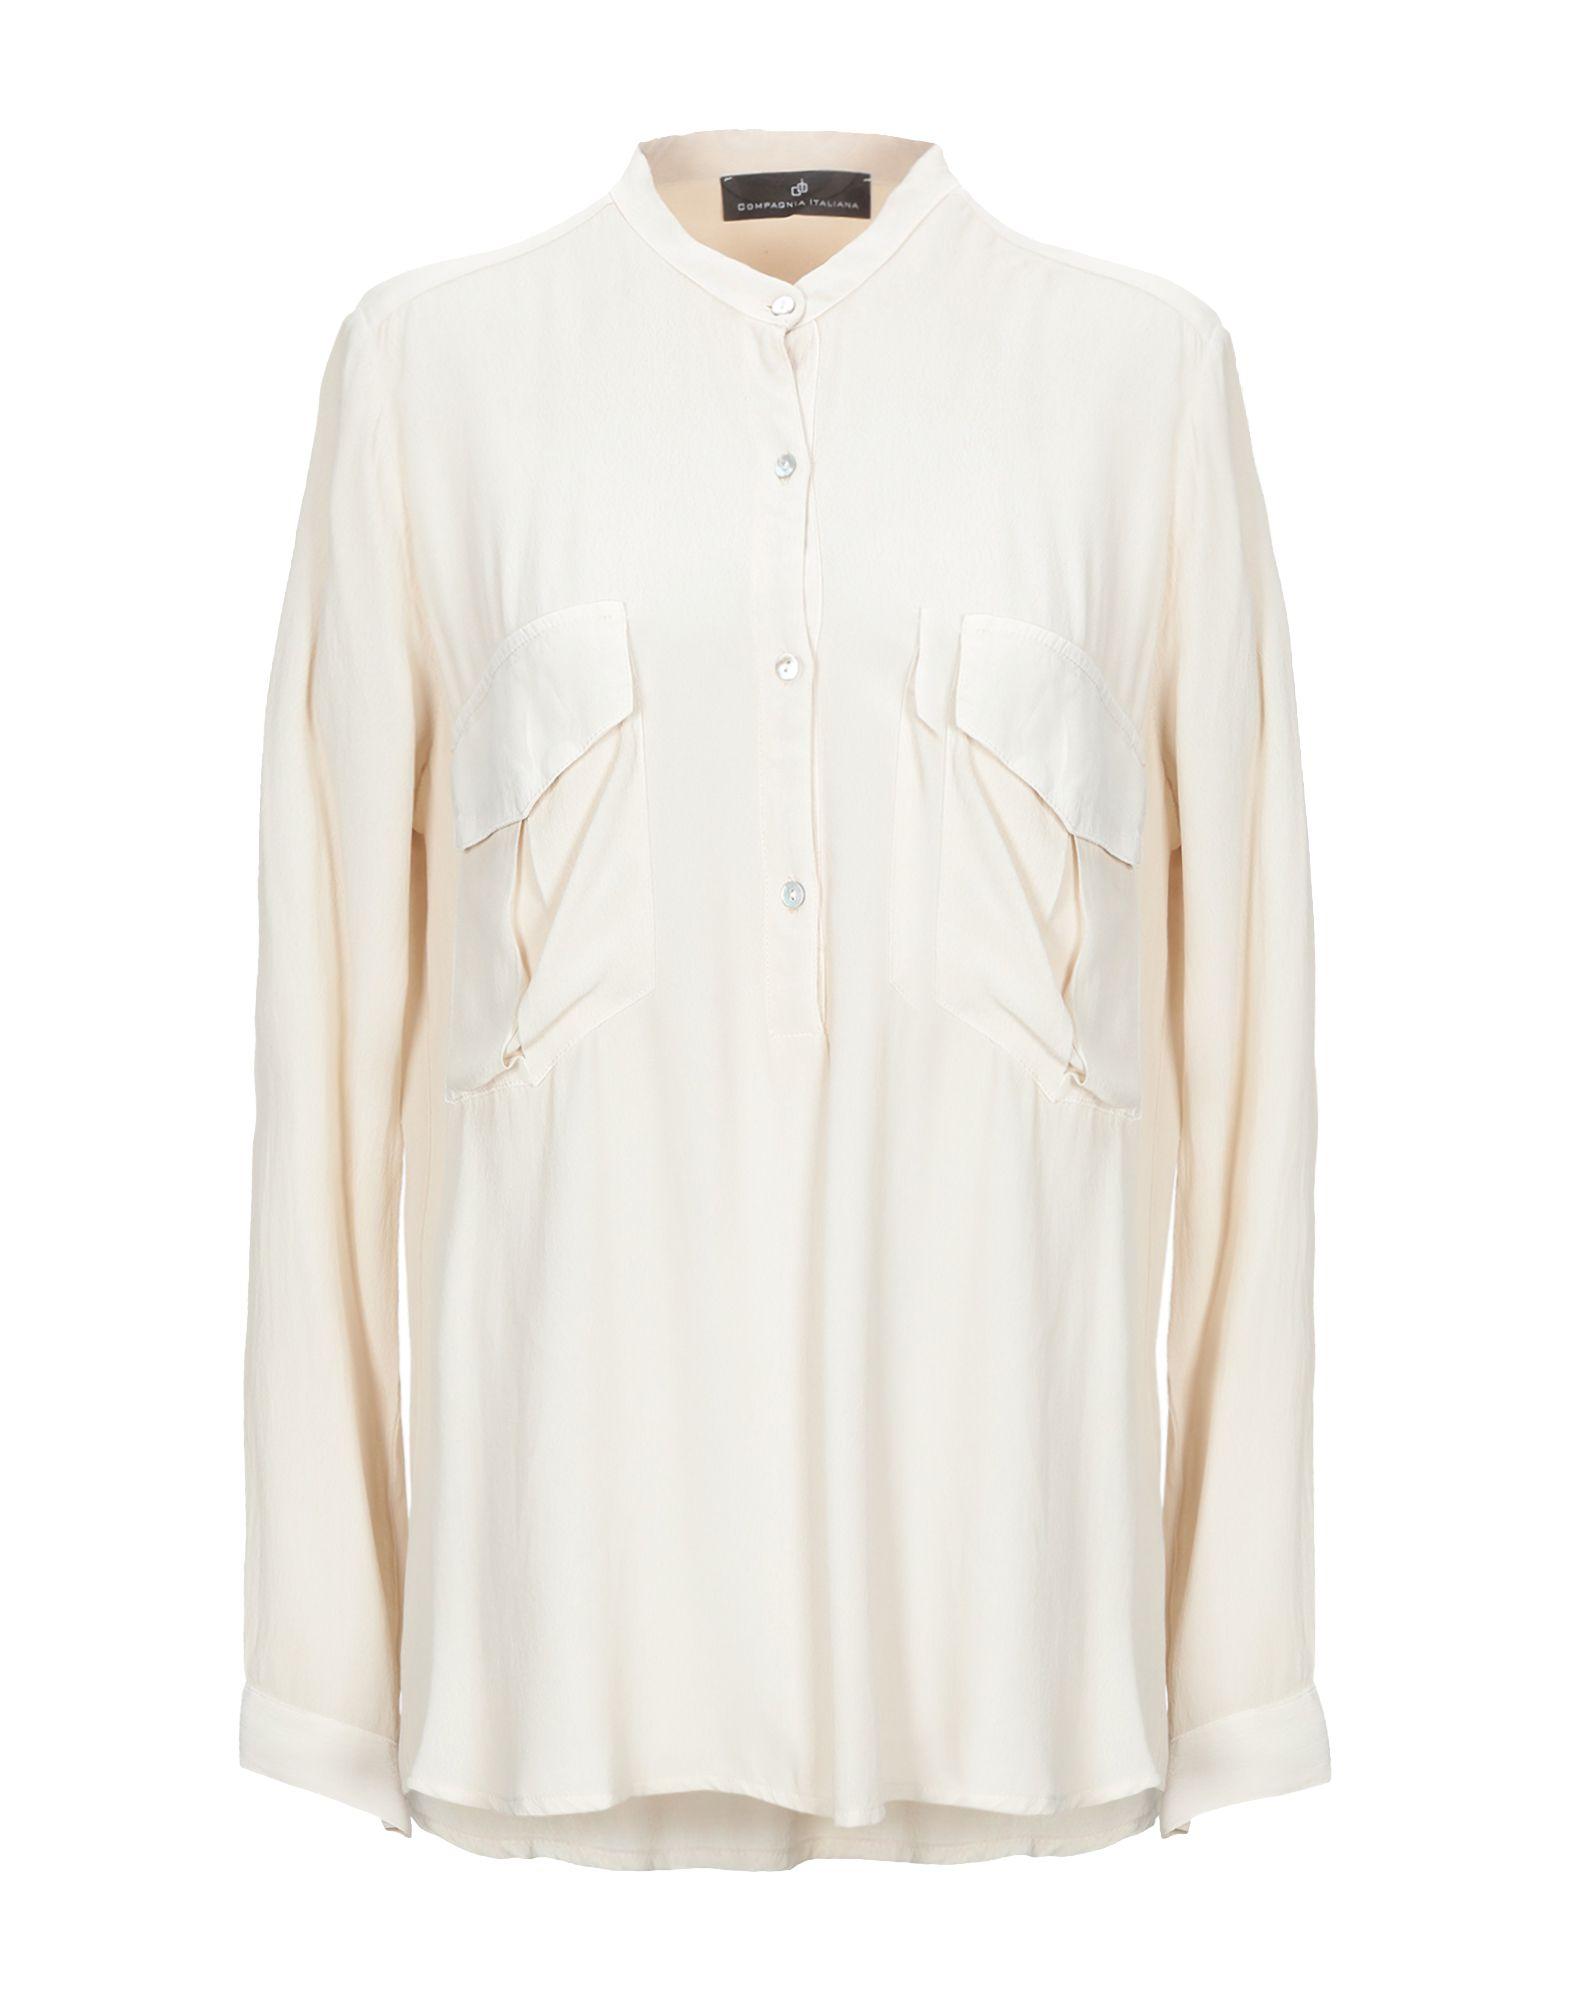 цена COMPAGNIA ITALIANA Pубашка в интернет-магазинах